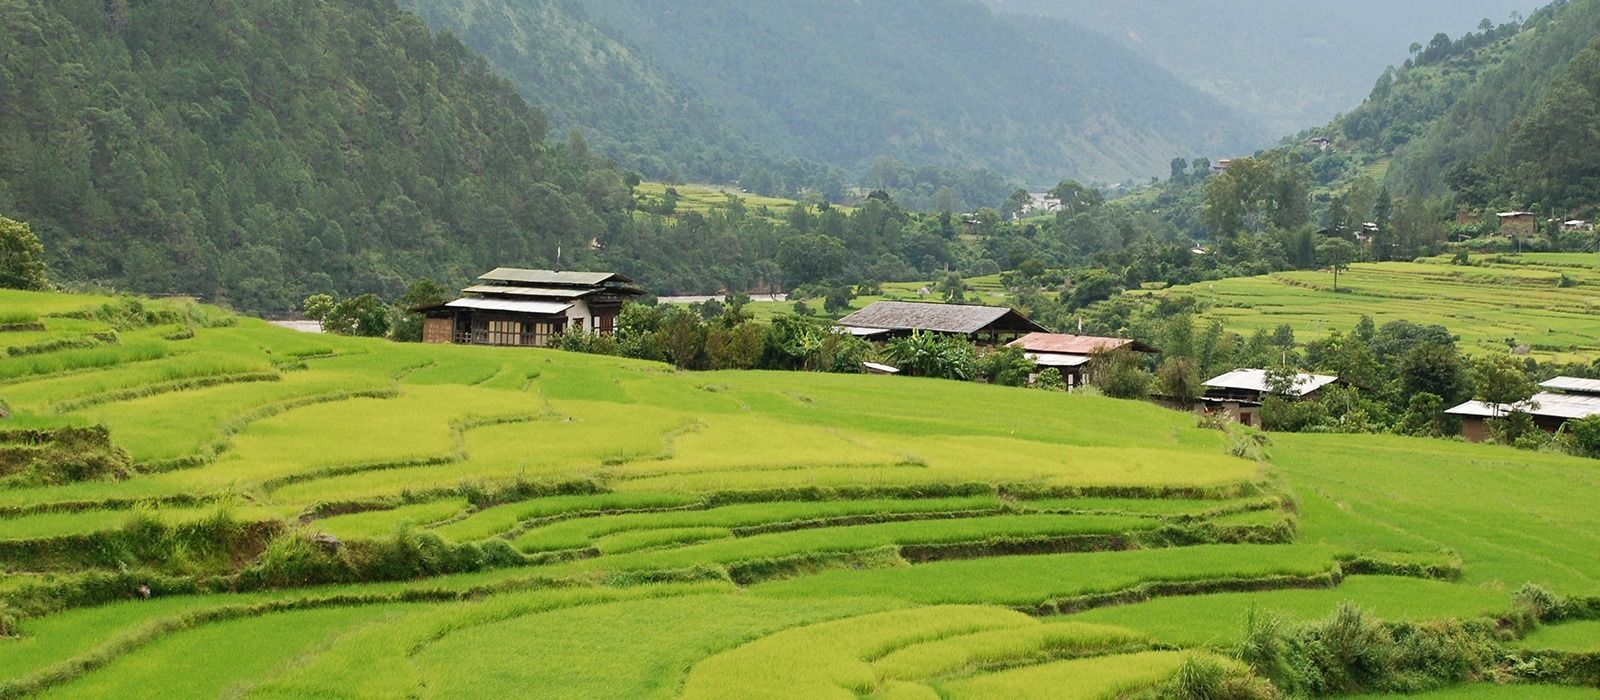 Nepalreise: Paläste, Tiger und Himalaya Urlaub 7